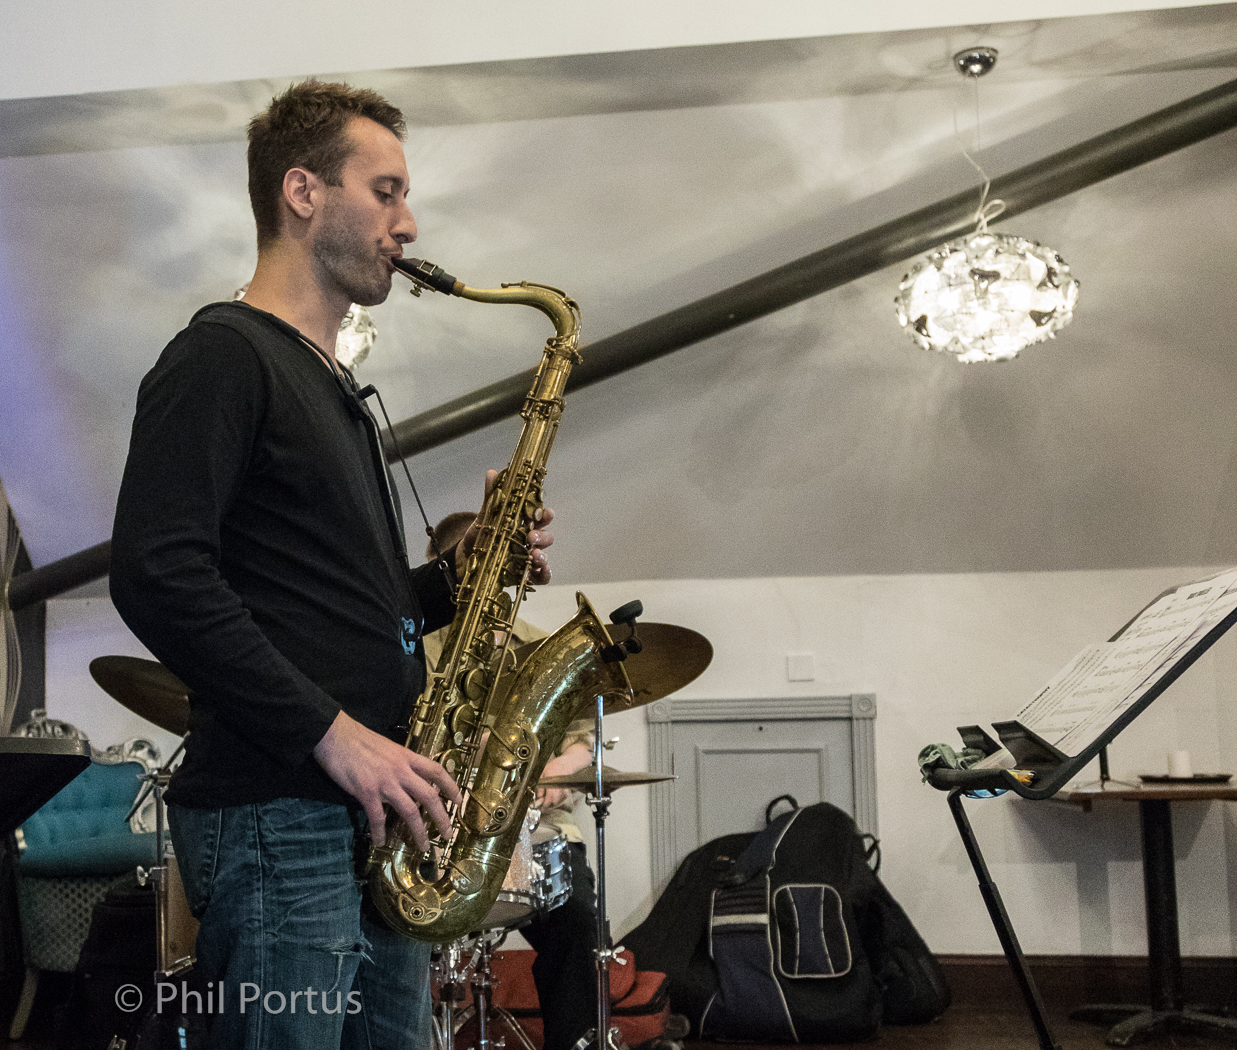 Jeff Guntren with Jami Sheriff trio @Seven Arts -9 Dec 1.30pm